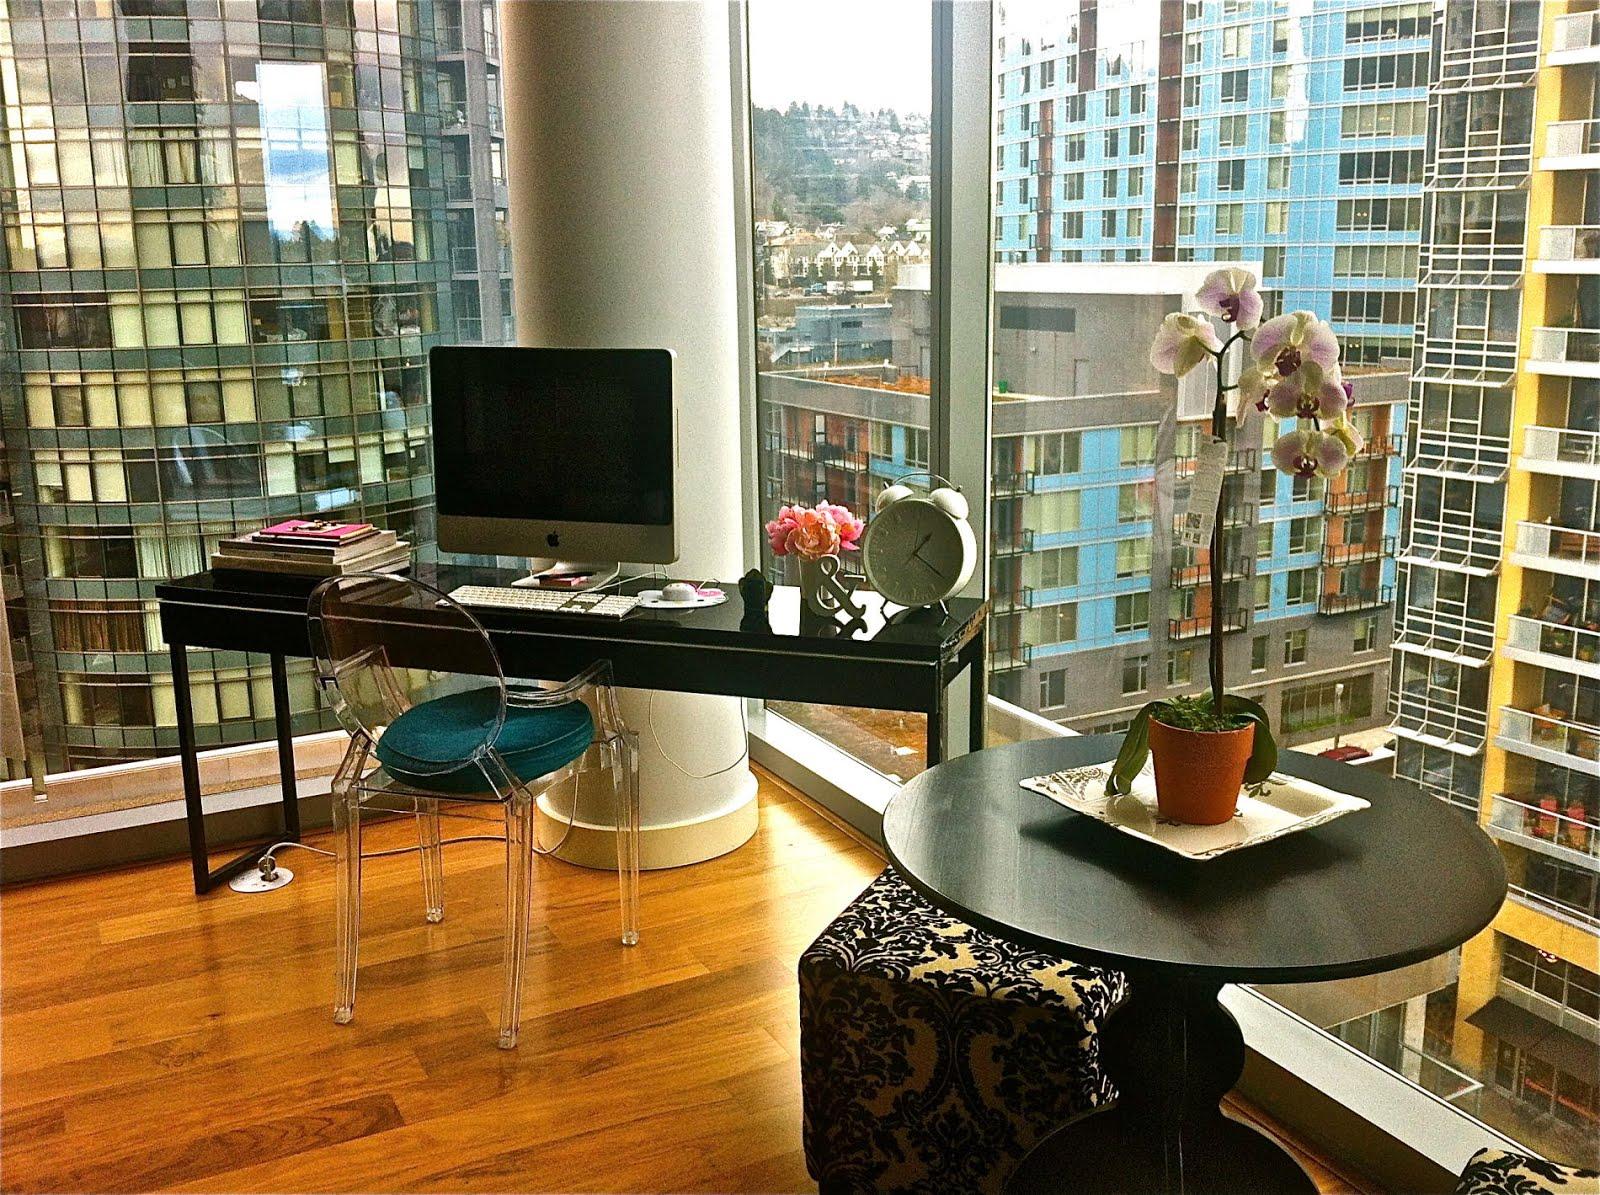 Terrific Modern Workspace Designs with Outstanding Ideas - home987.blogspot.com